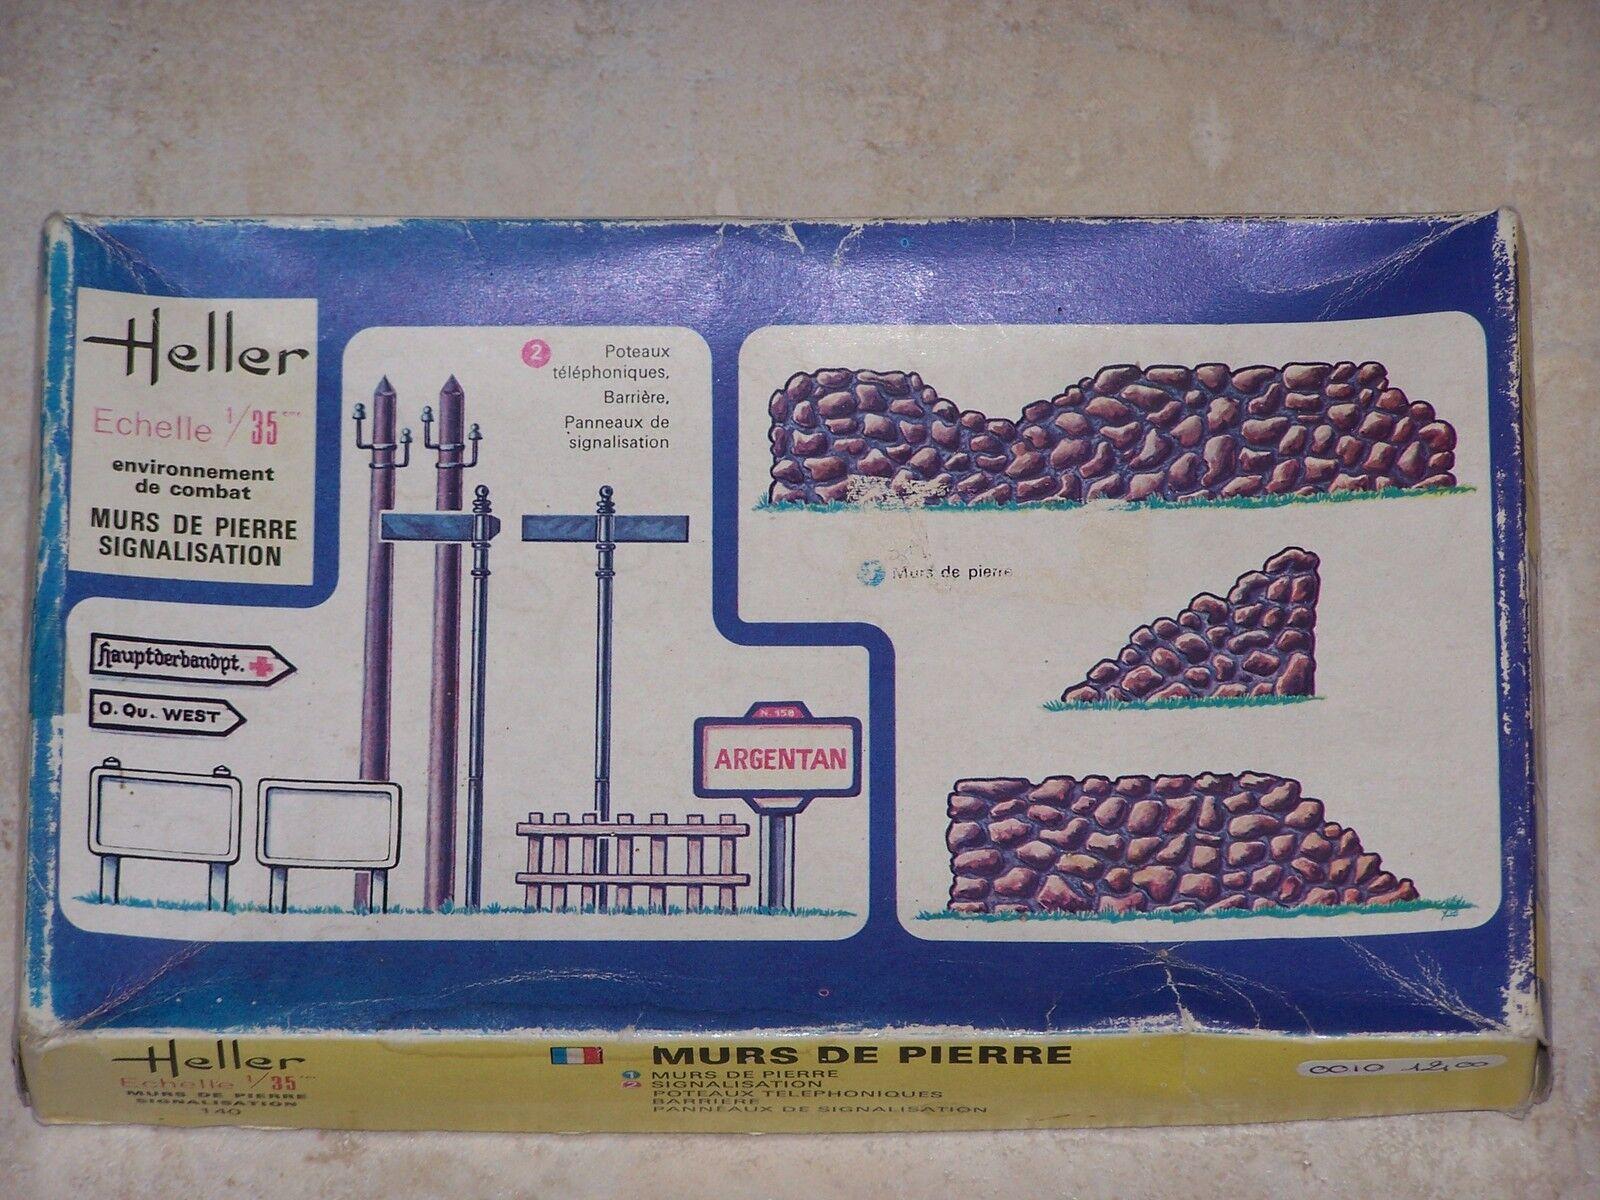 Diorama Heller  1 35ème MURS DE PIERRE SIGNALISATION